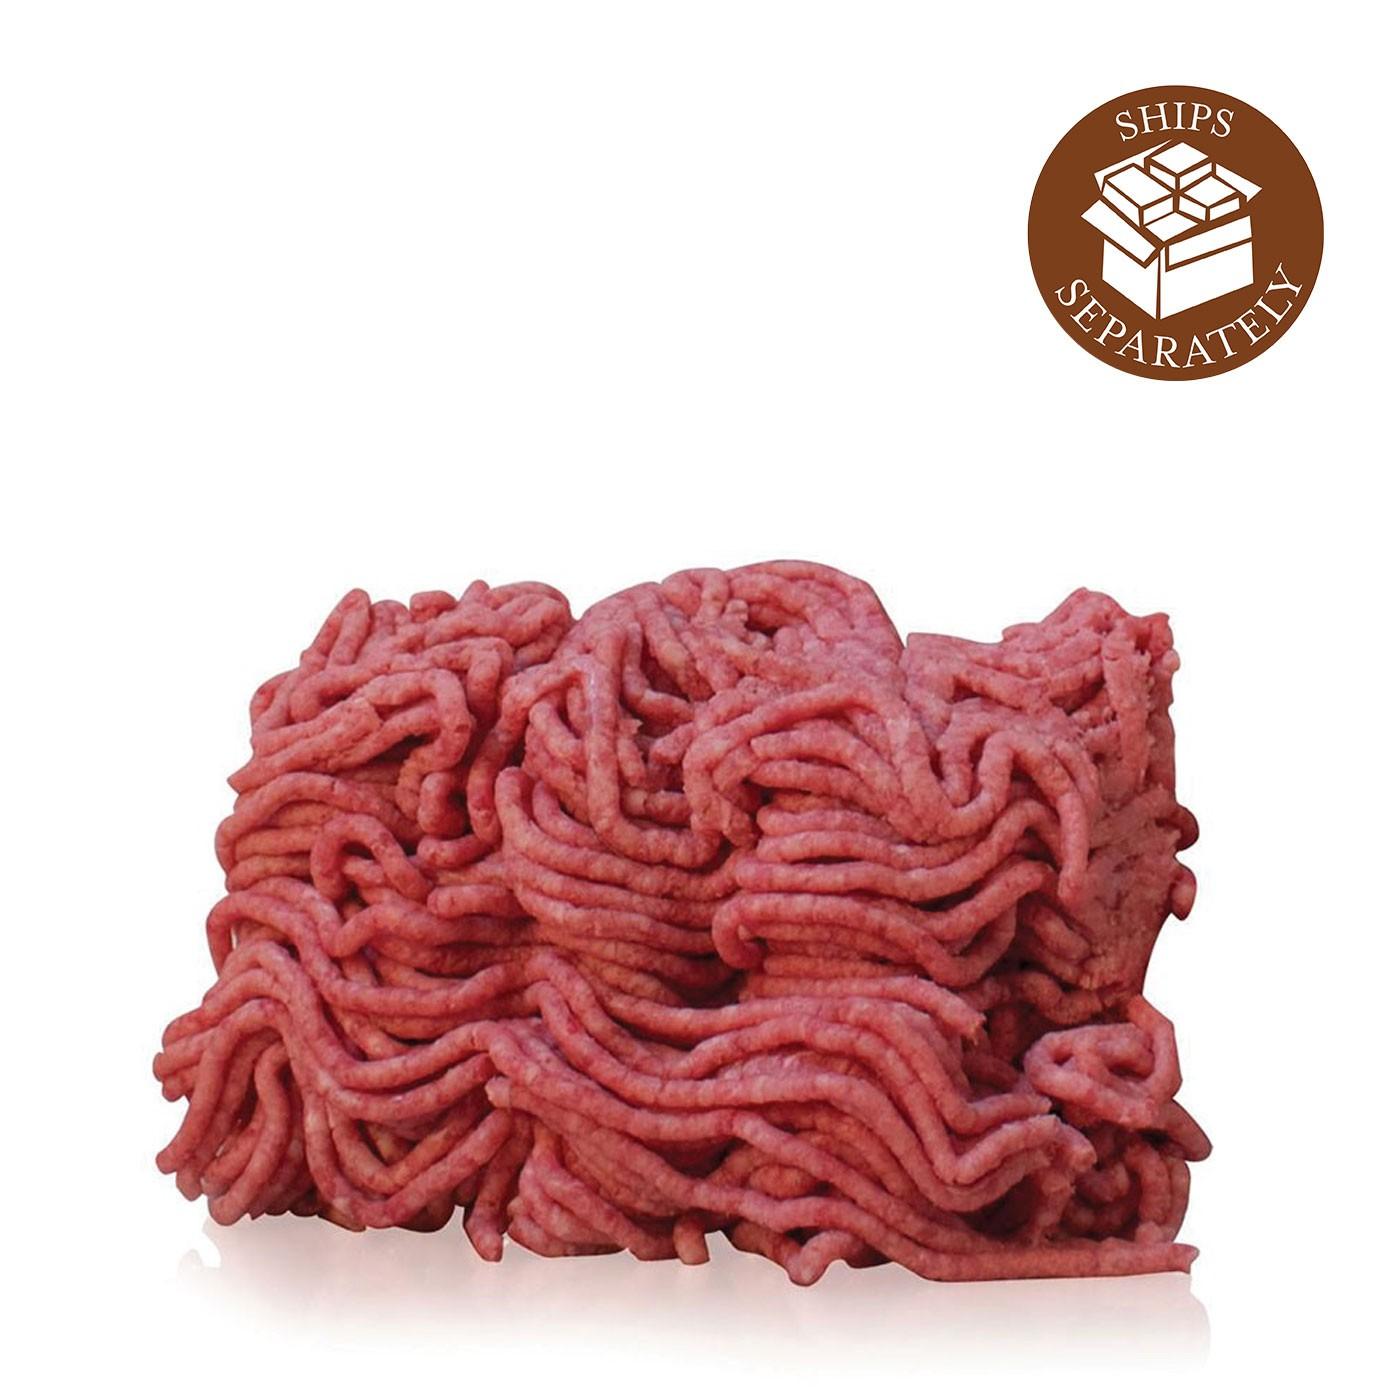 Meatball Mix: Heritage Breed Hampshire Pork, Prime Black Angus Beef, Milk-fed Veal, 3 lbs